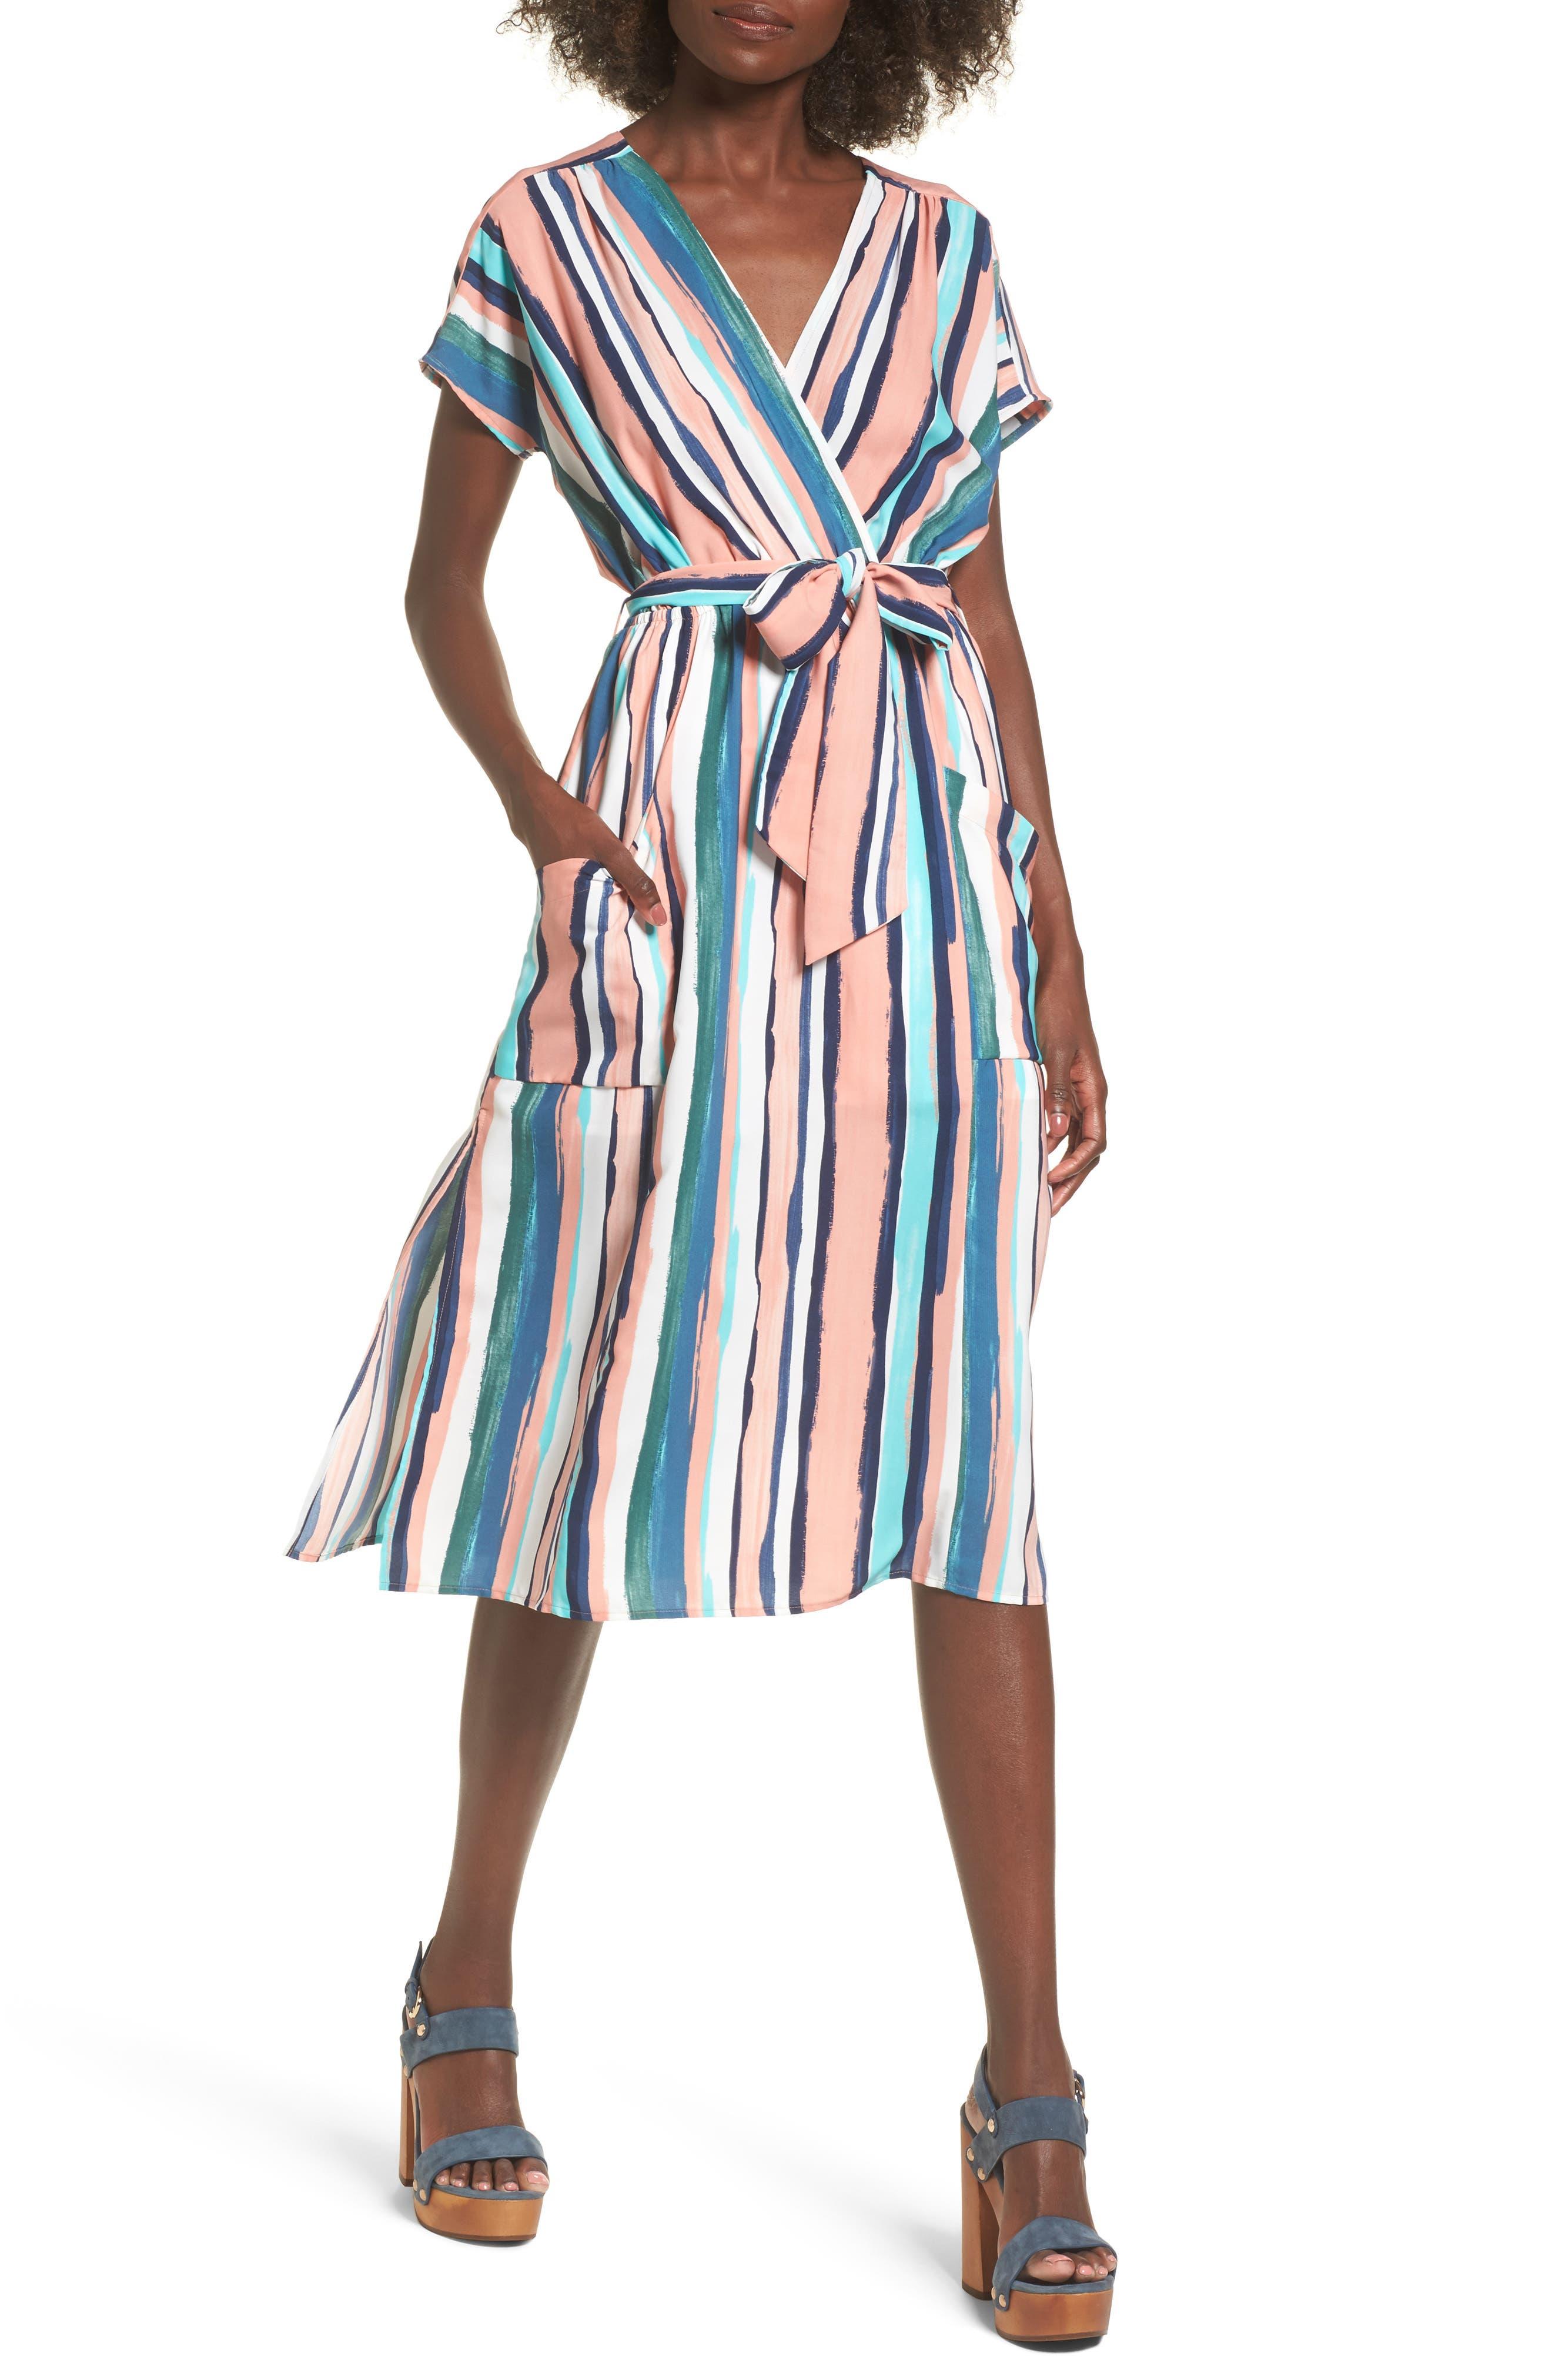 Santorini Faux Wrap Dress,                             Main thumbnail 1, color,                             MULTI PEACH